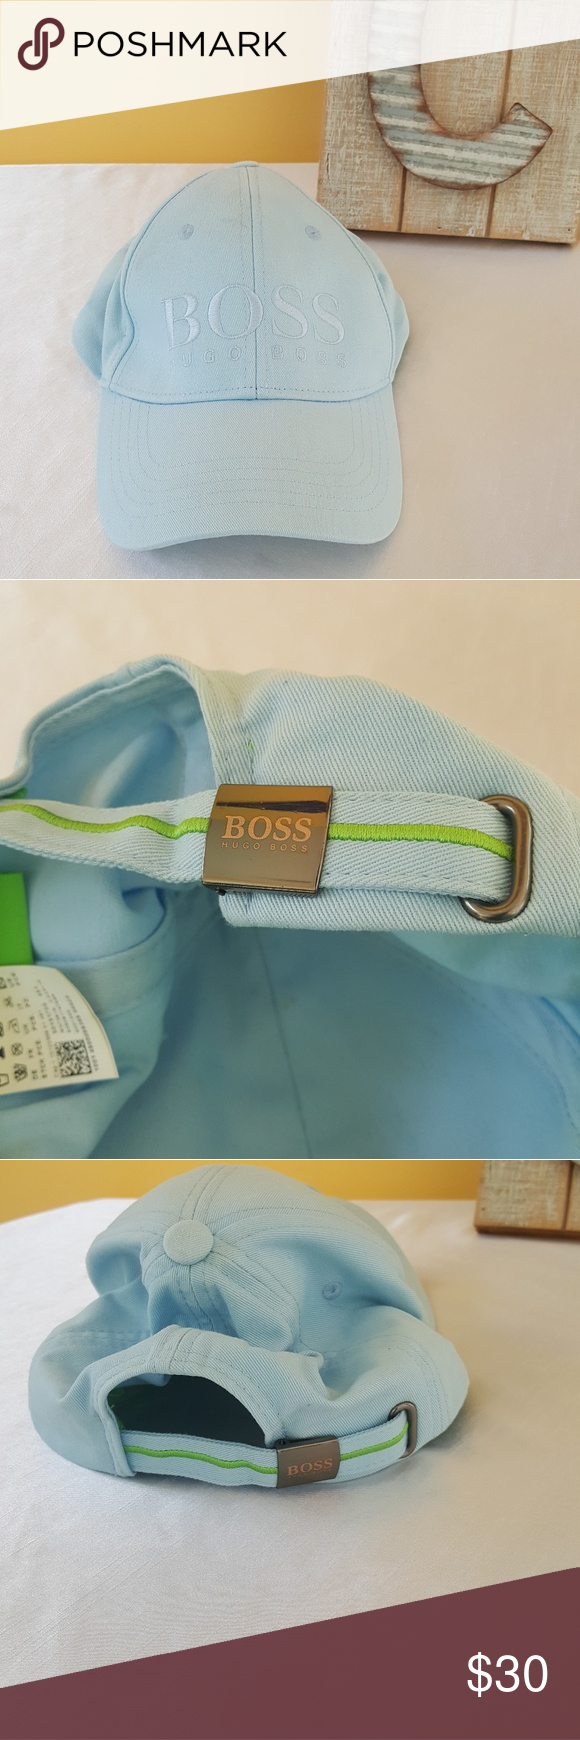 4a311d0b42d Authentic Hugo Boss Hat Very good condition. Light blue color. Hugo Boss  Accessories Hats